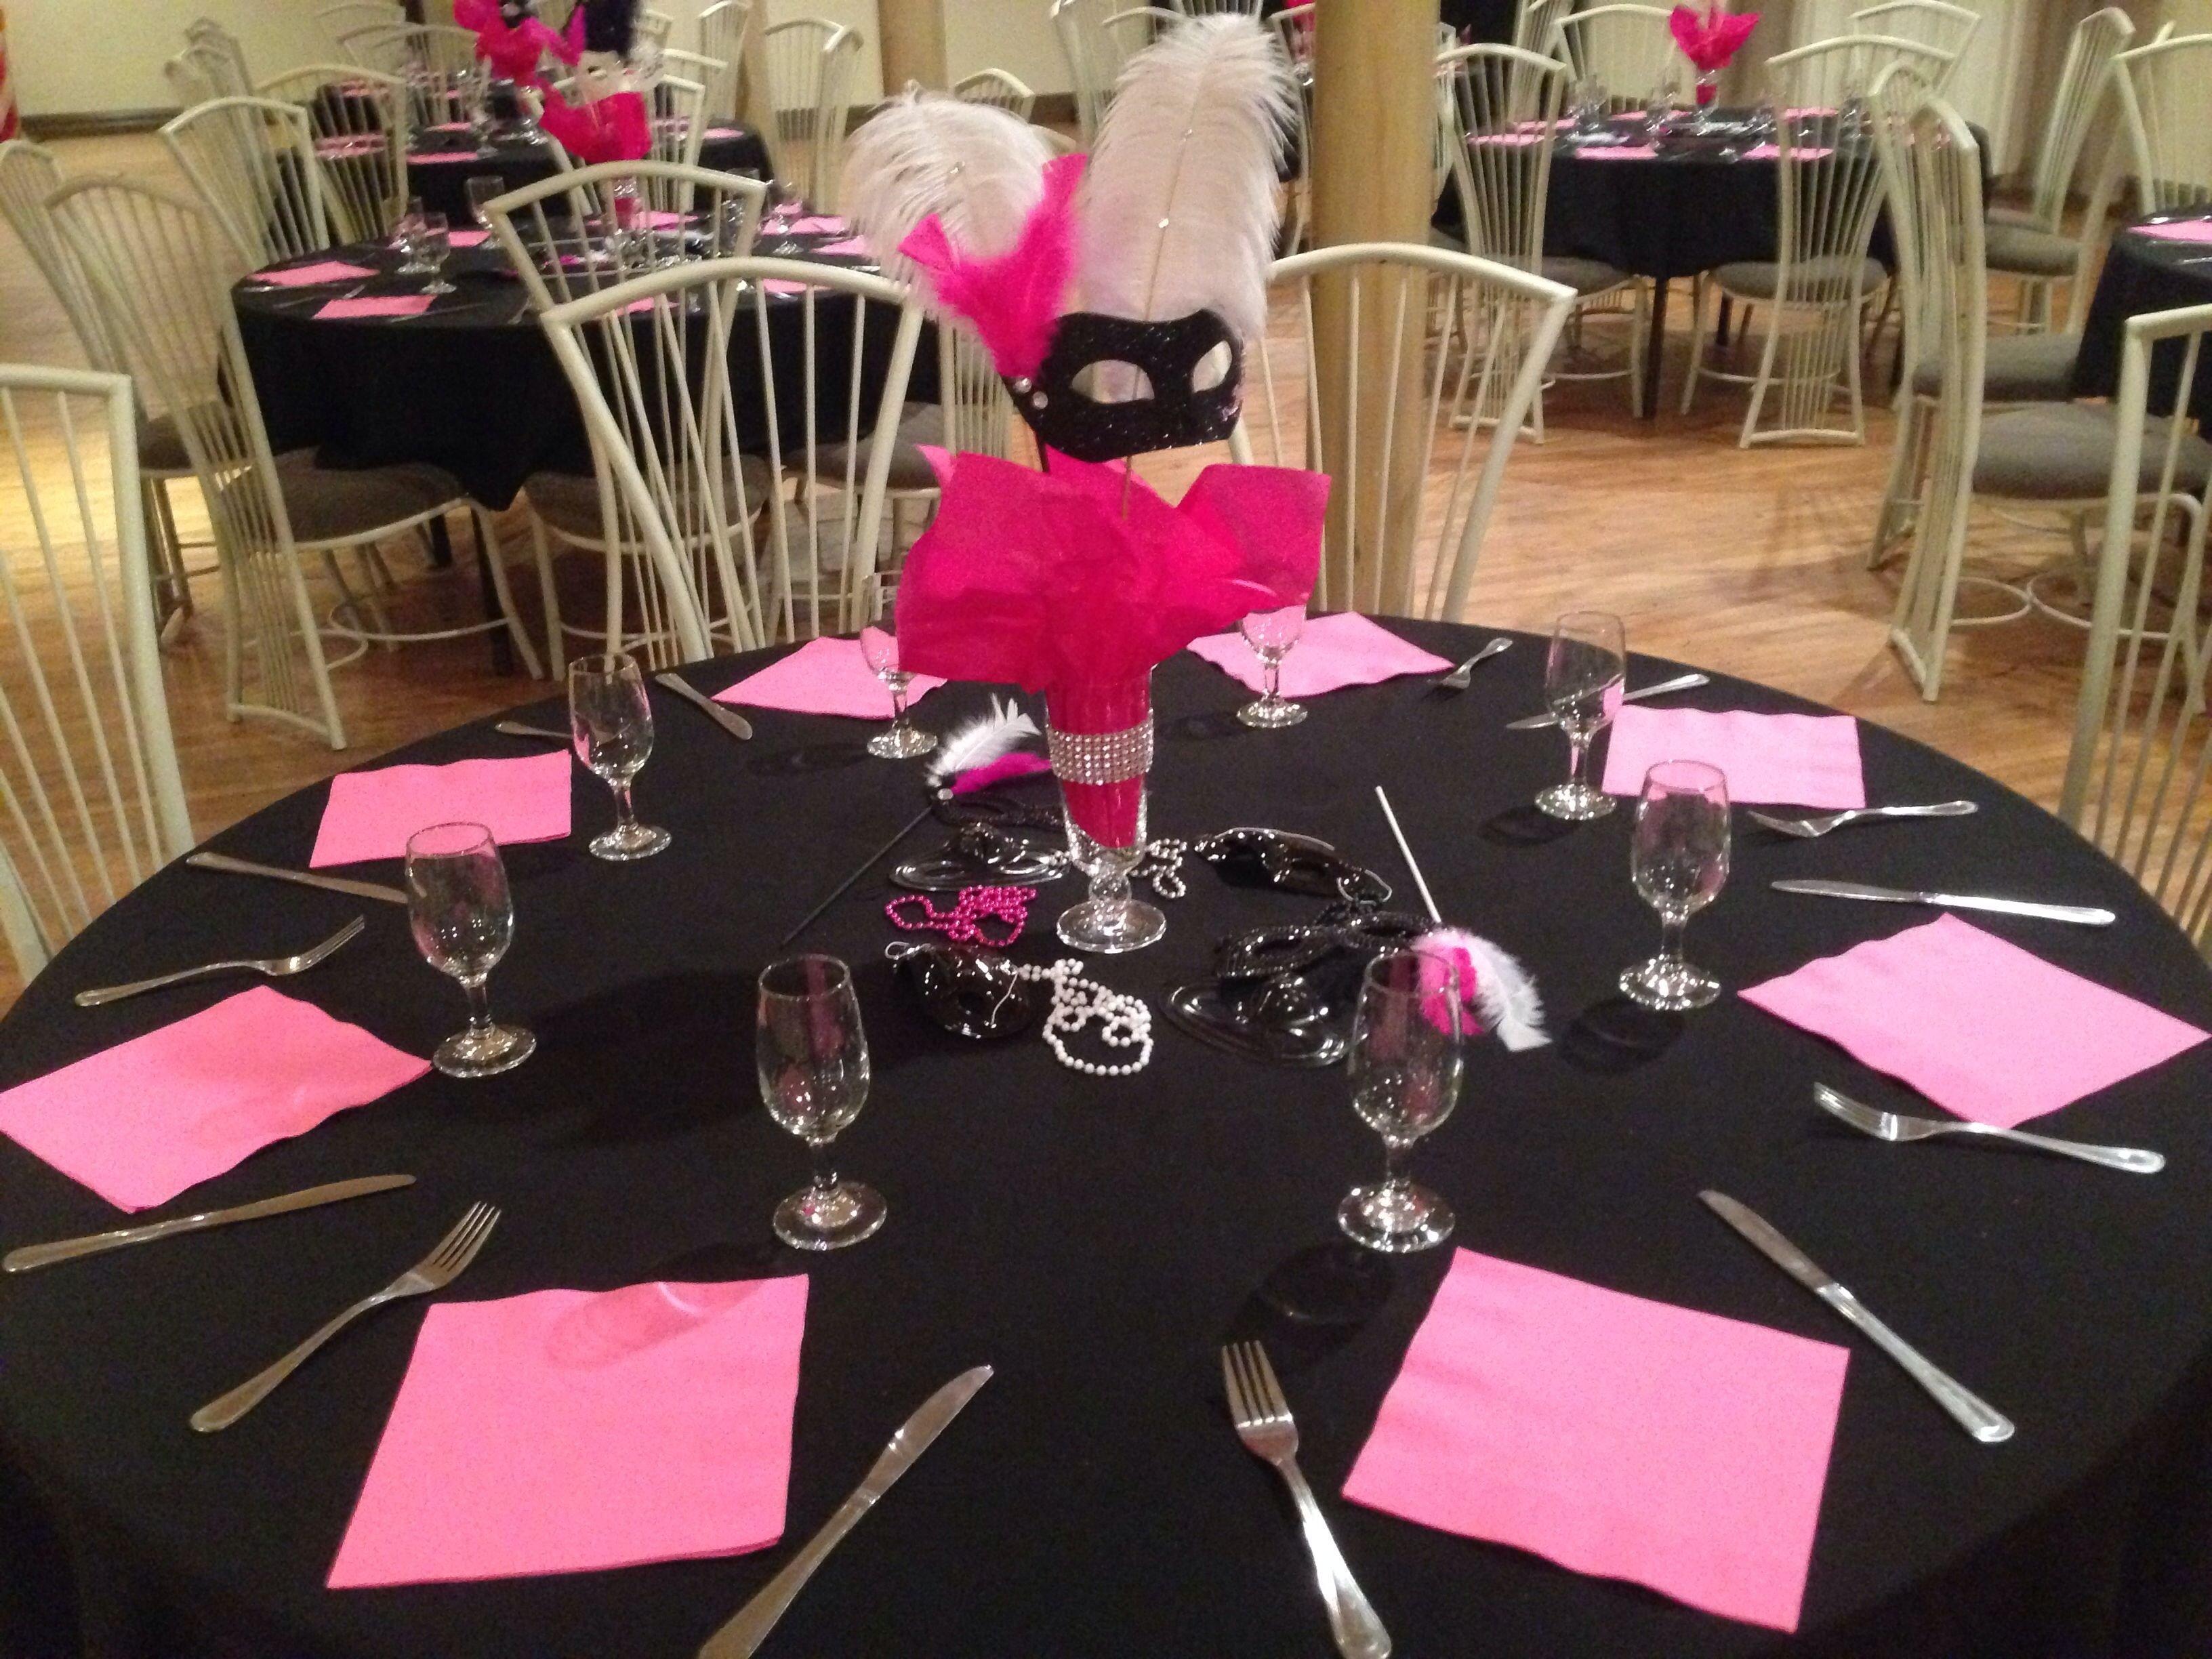 10 Elegant Masquerade Party Ideas Sweet 16 masquerade sweet sixteen party decorations masquerade party 2020